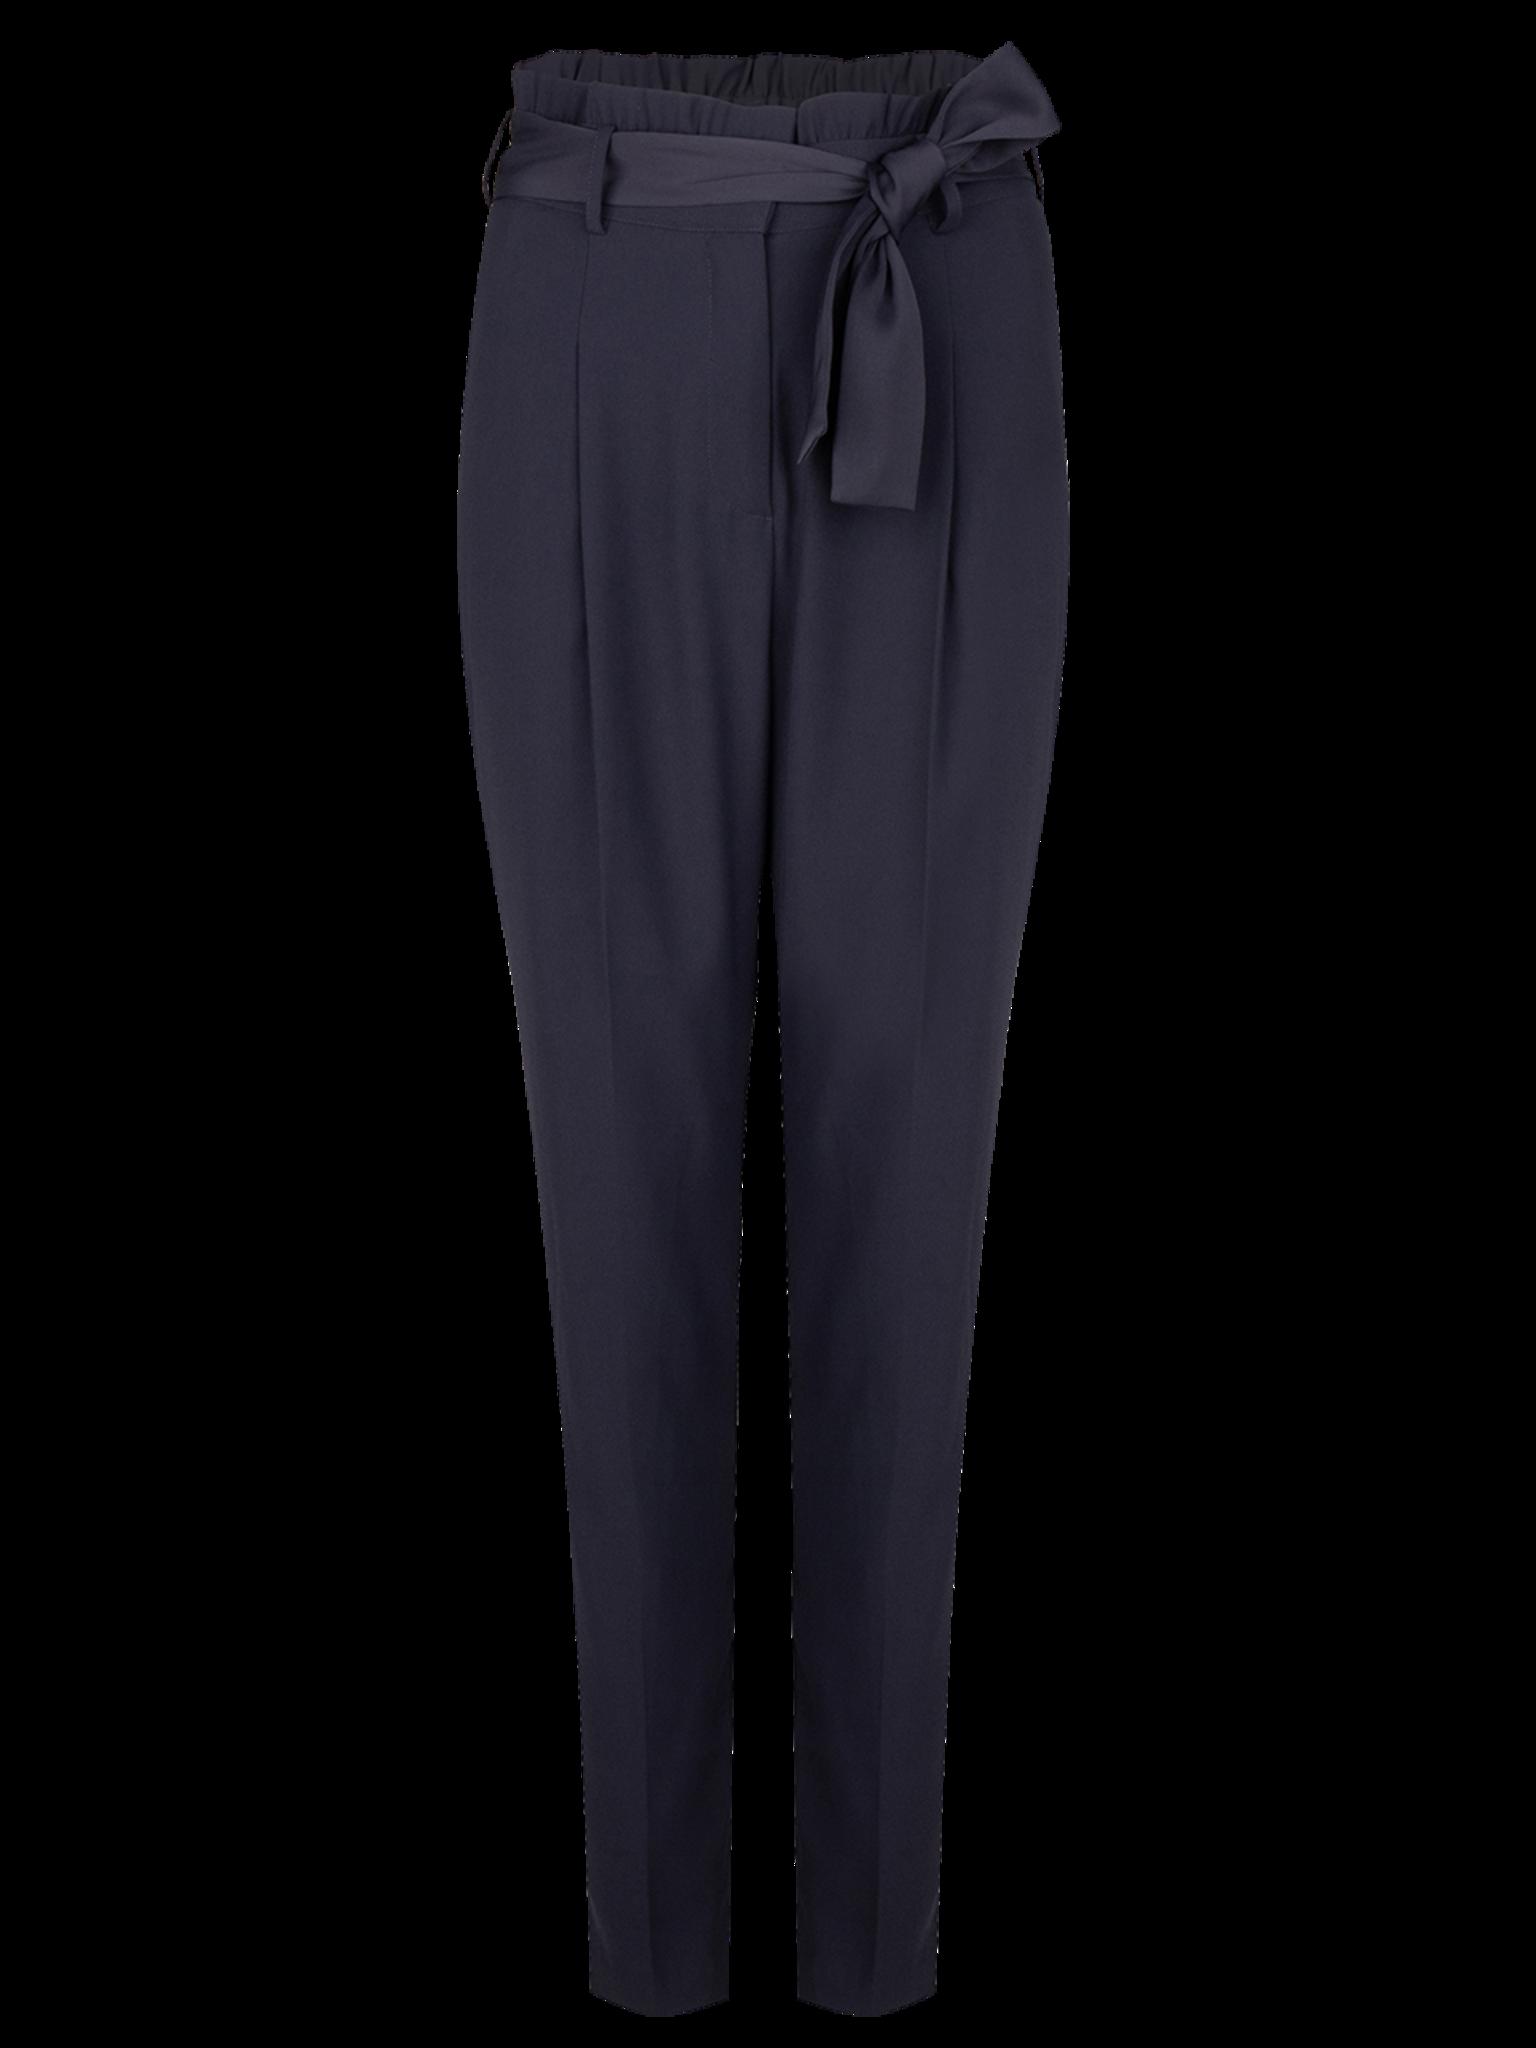 Dante 6 Trouser 211518 BRANDOO-1